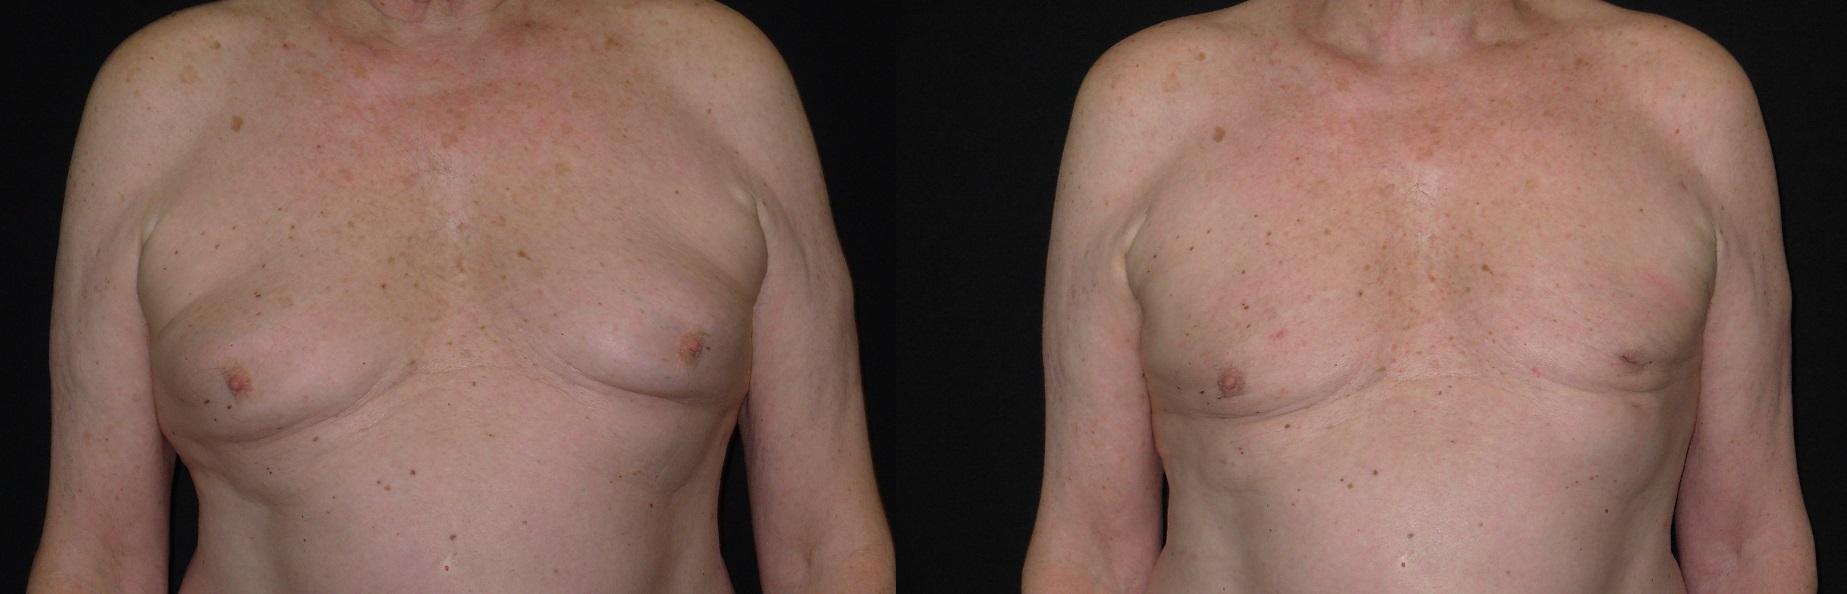 GynecoBA3432.jpg